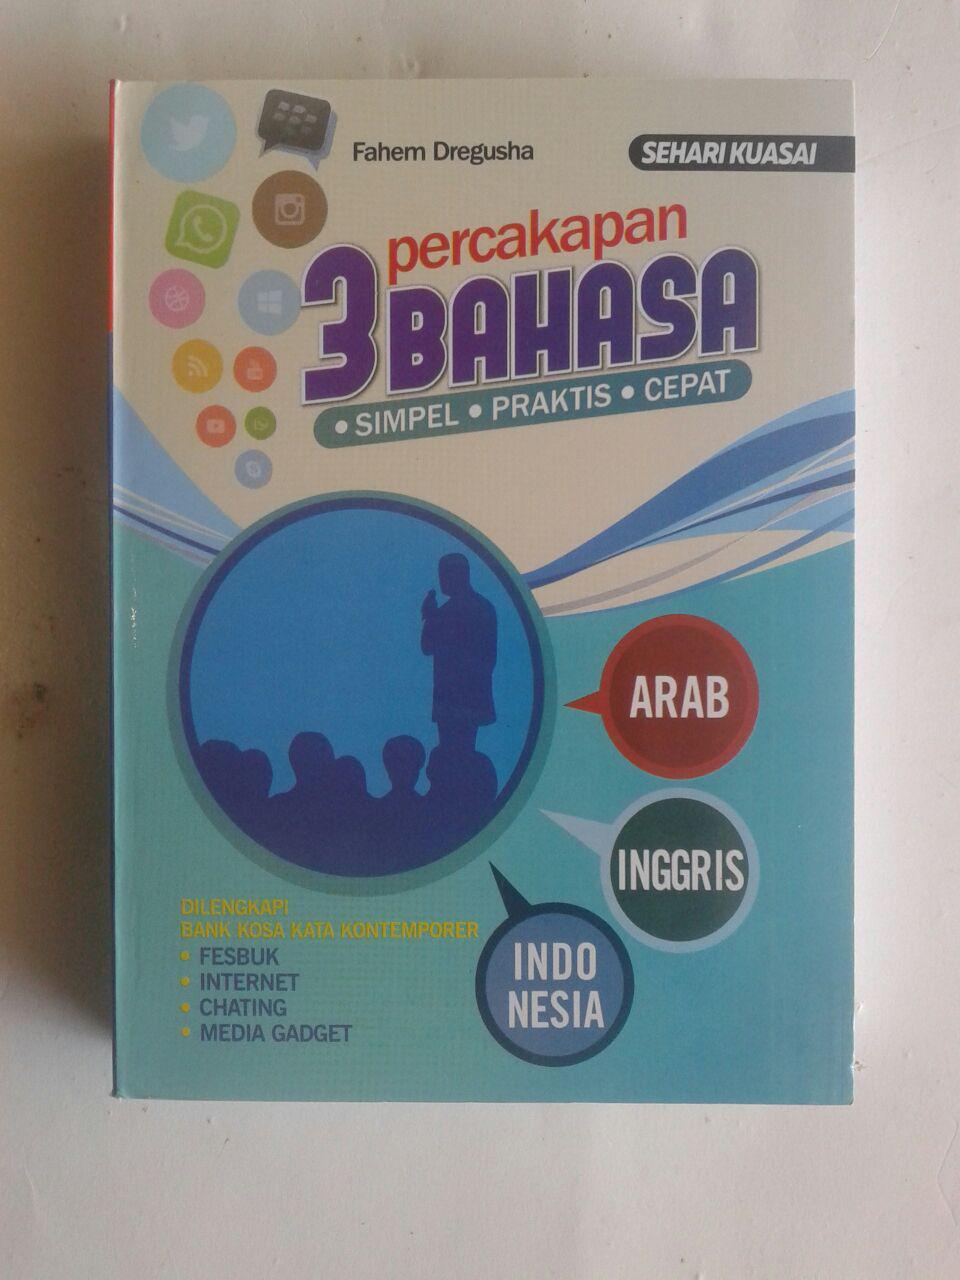 Buku Sehari Kuasai Percakapan 3 Bahasa Simpel Praktis Cepat cover 2